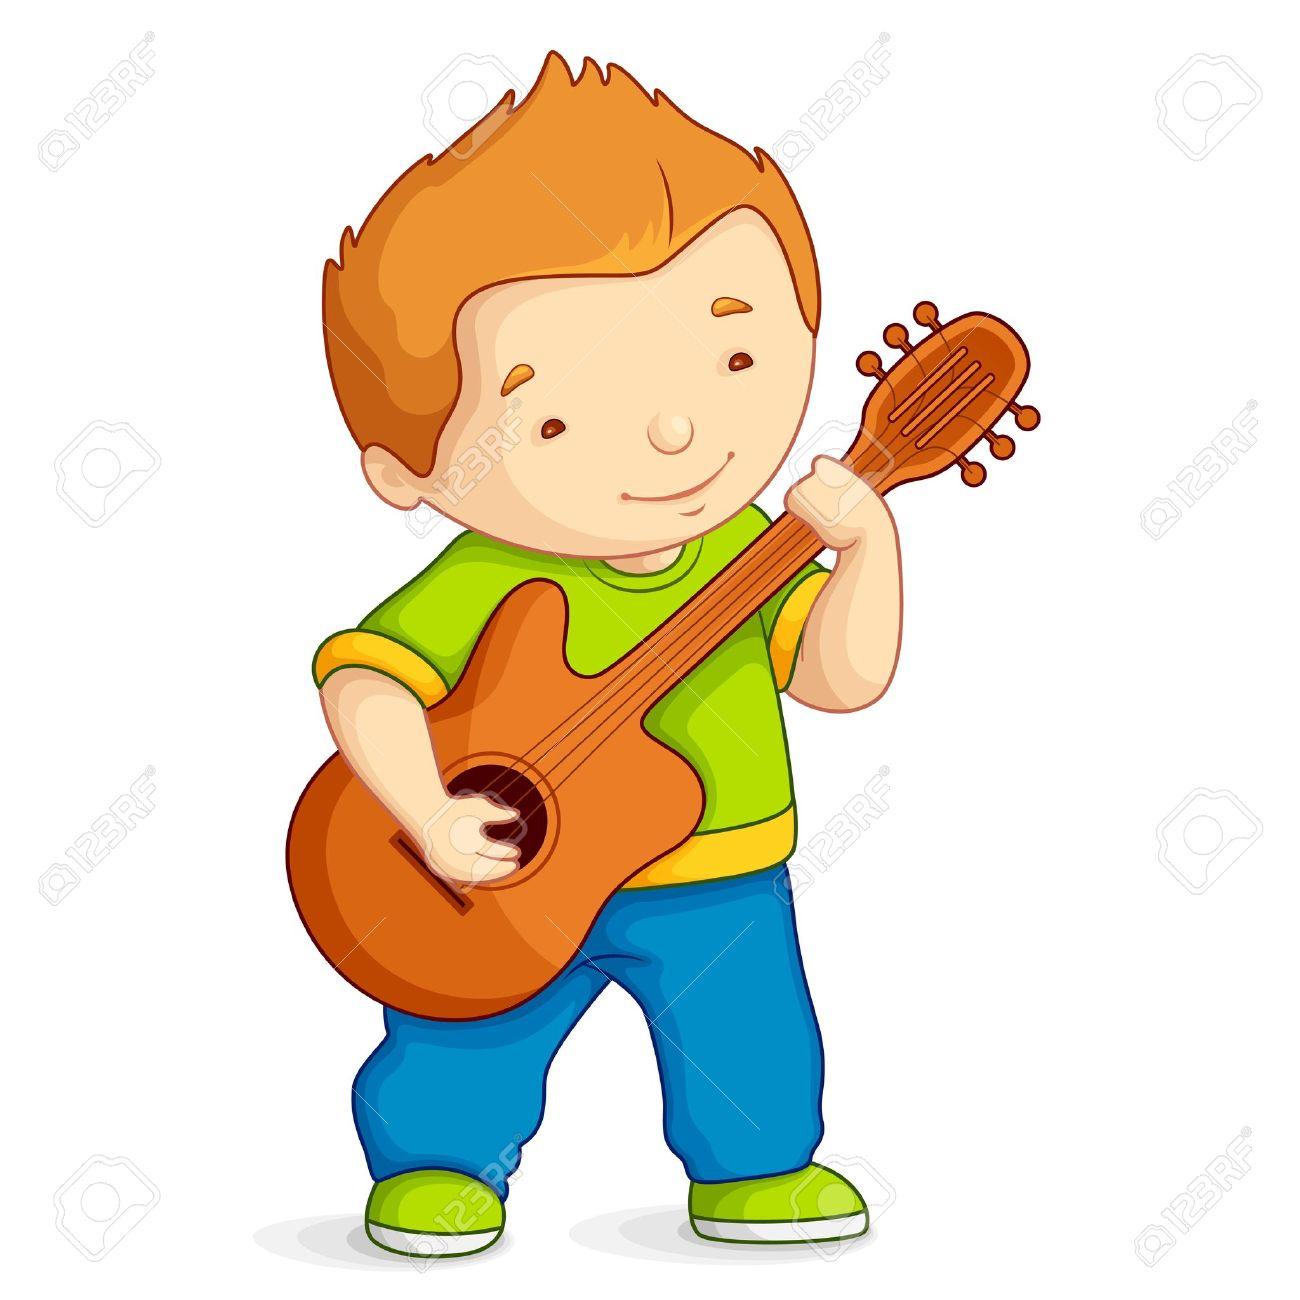 Kid Playing Guitar Royalty Free Cliparts, Vectors, And Stock.